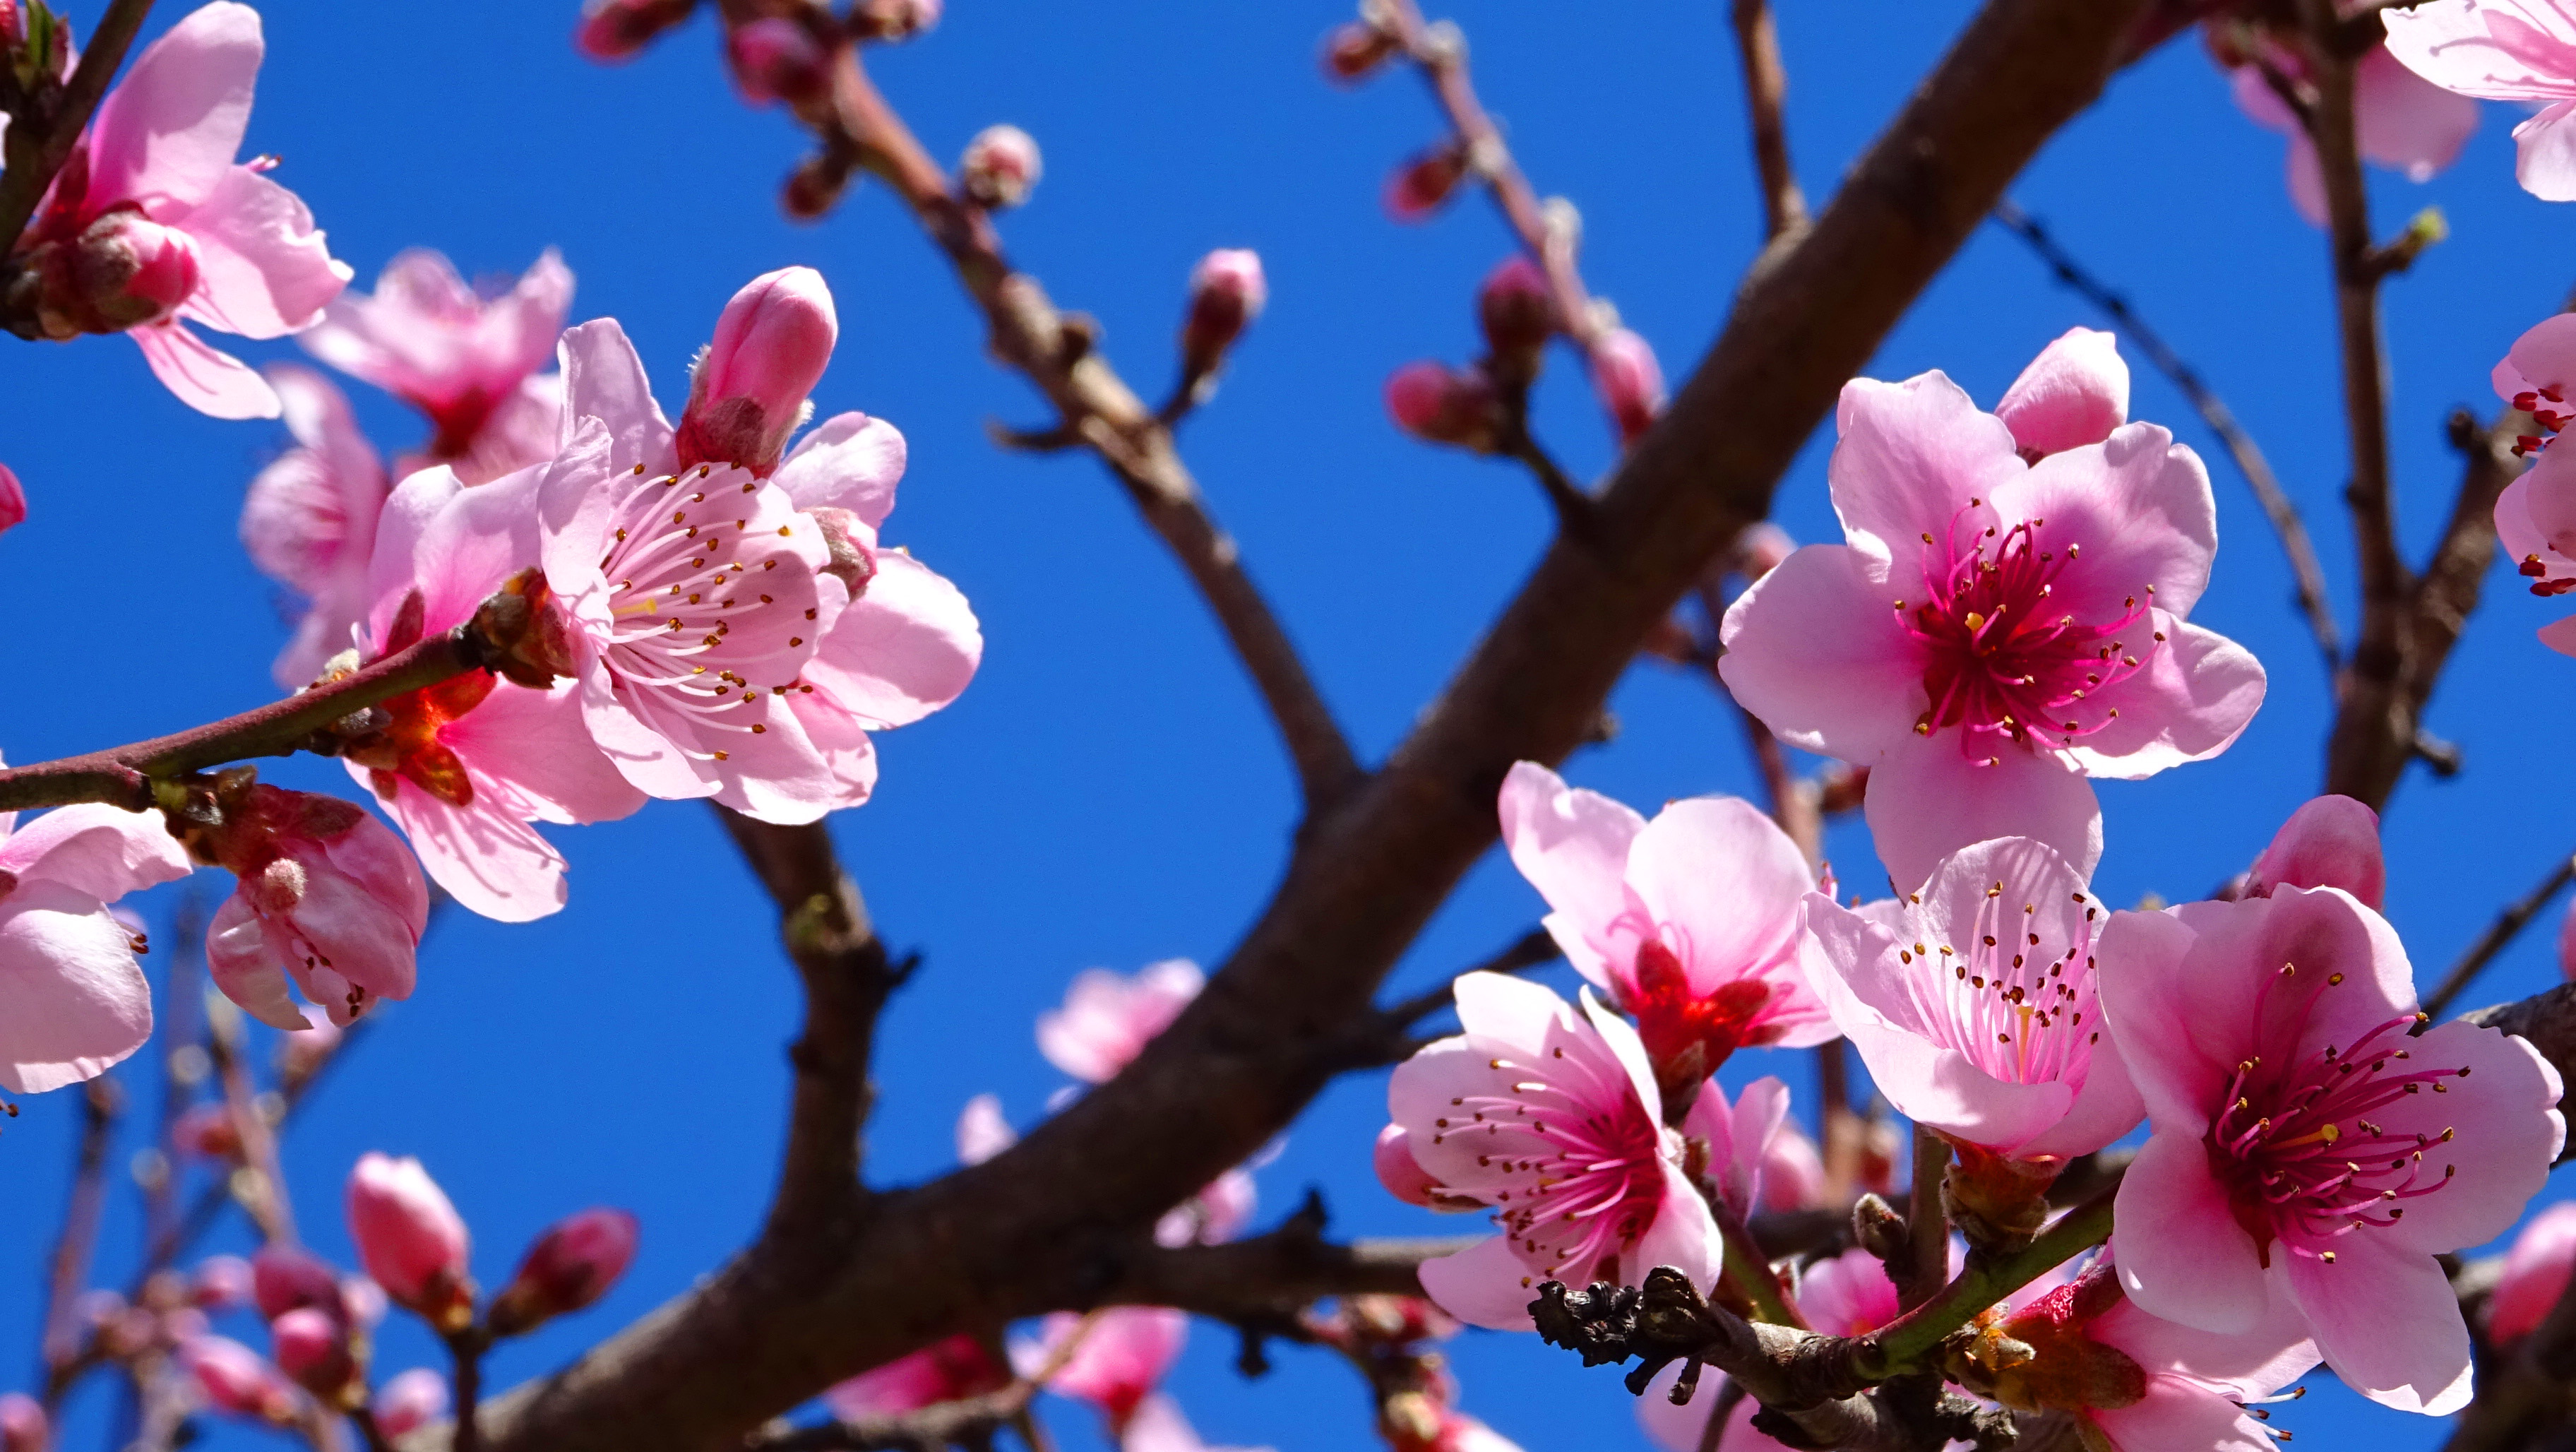 Spring Capital Life And Random Beauty